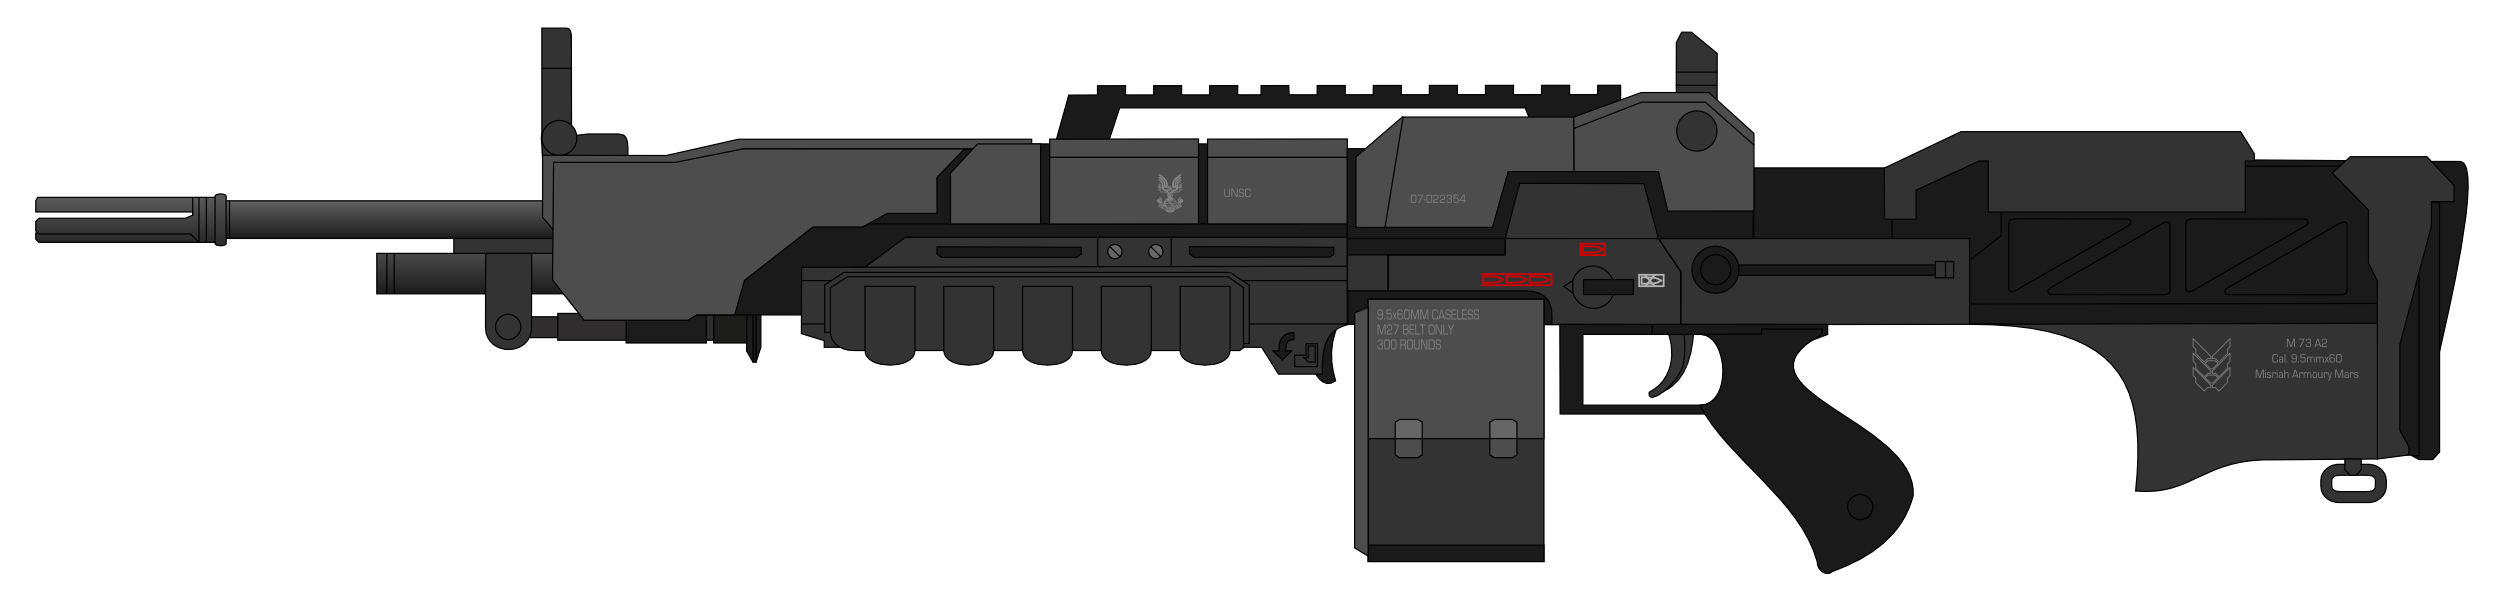 shotgun machine gun